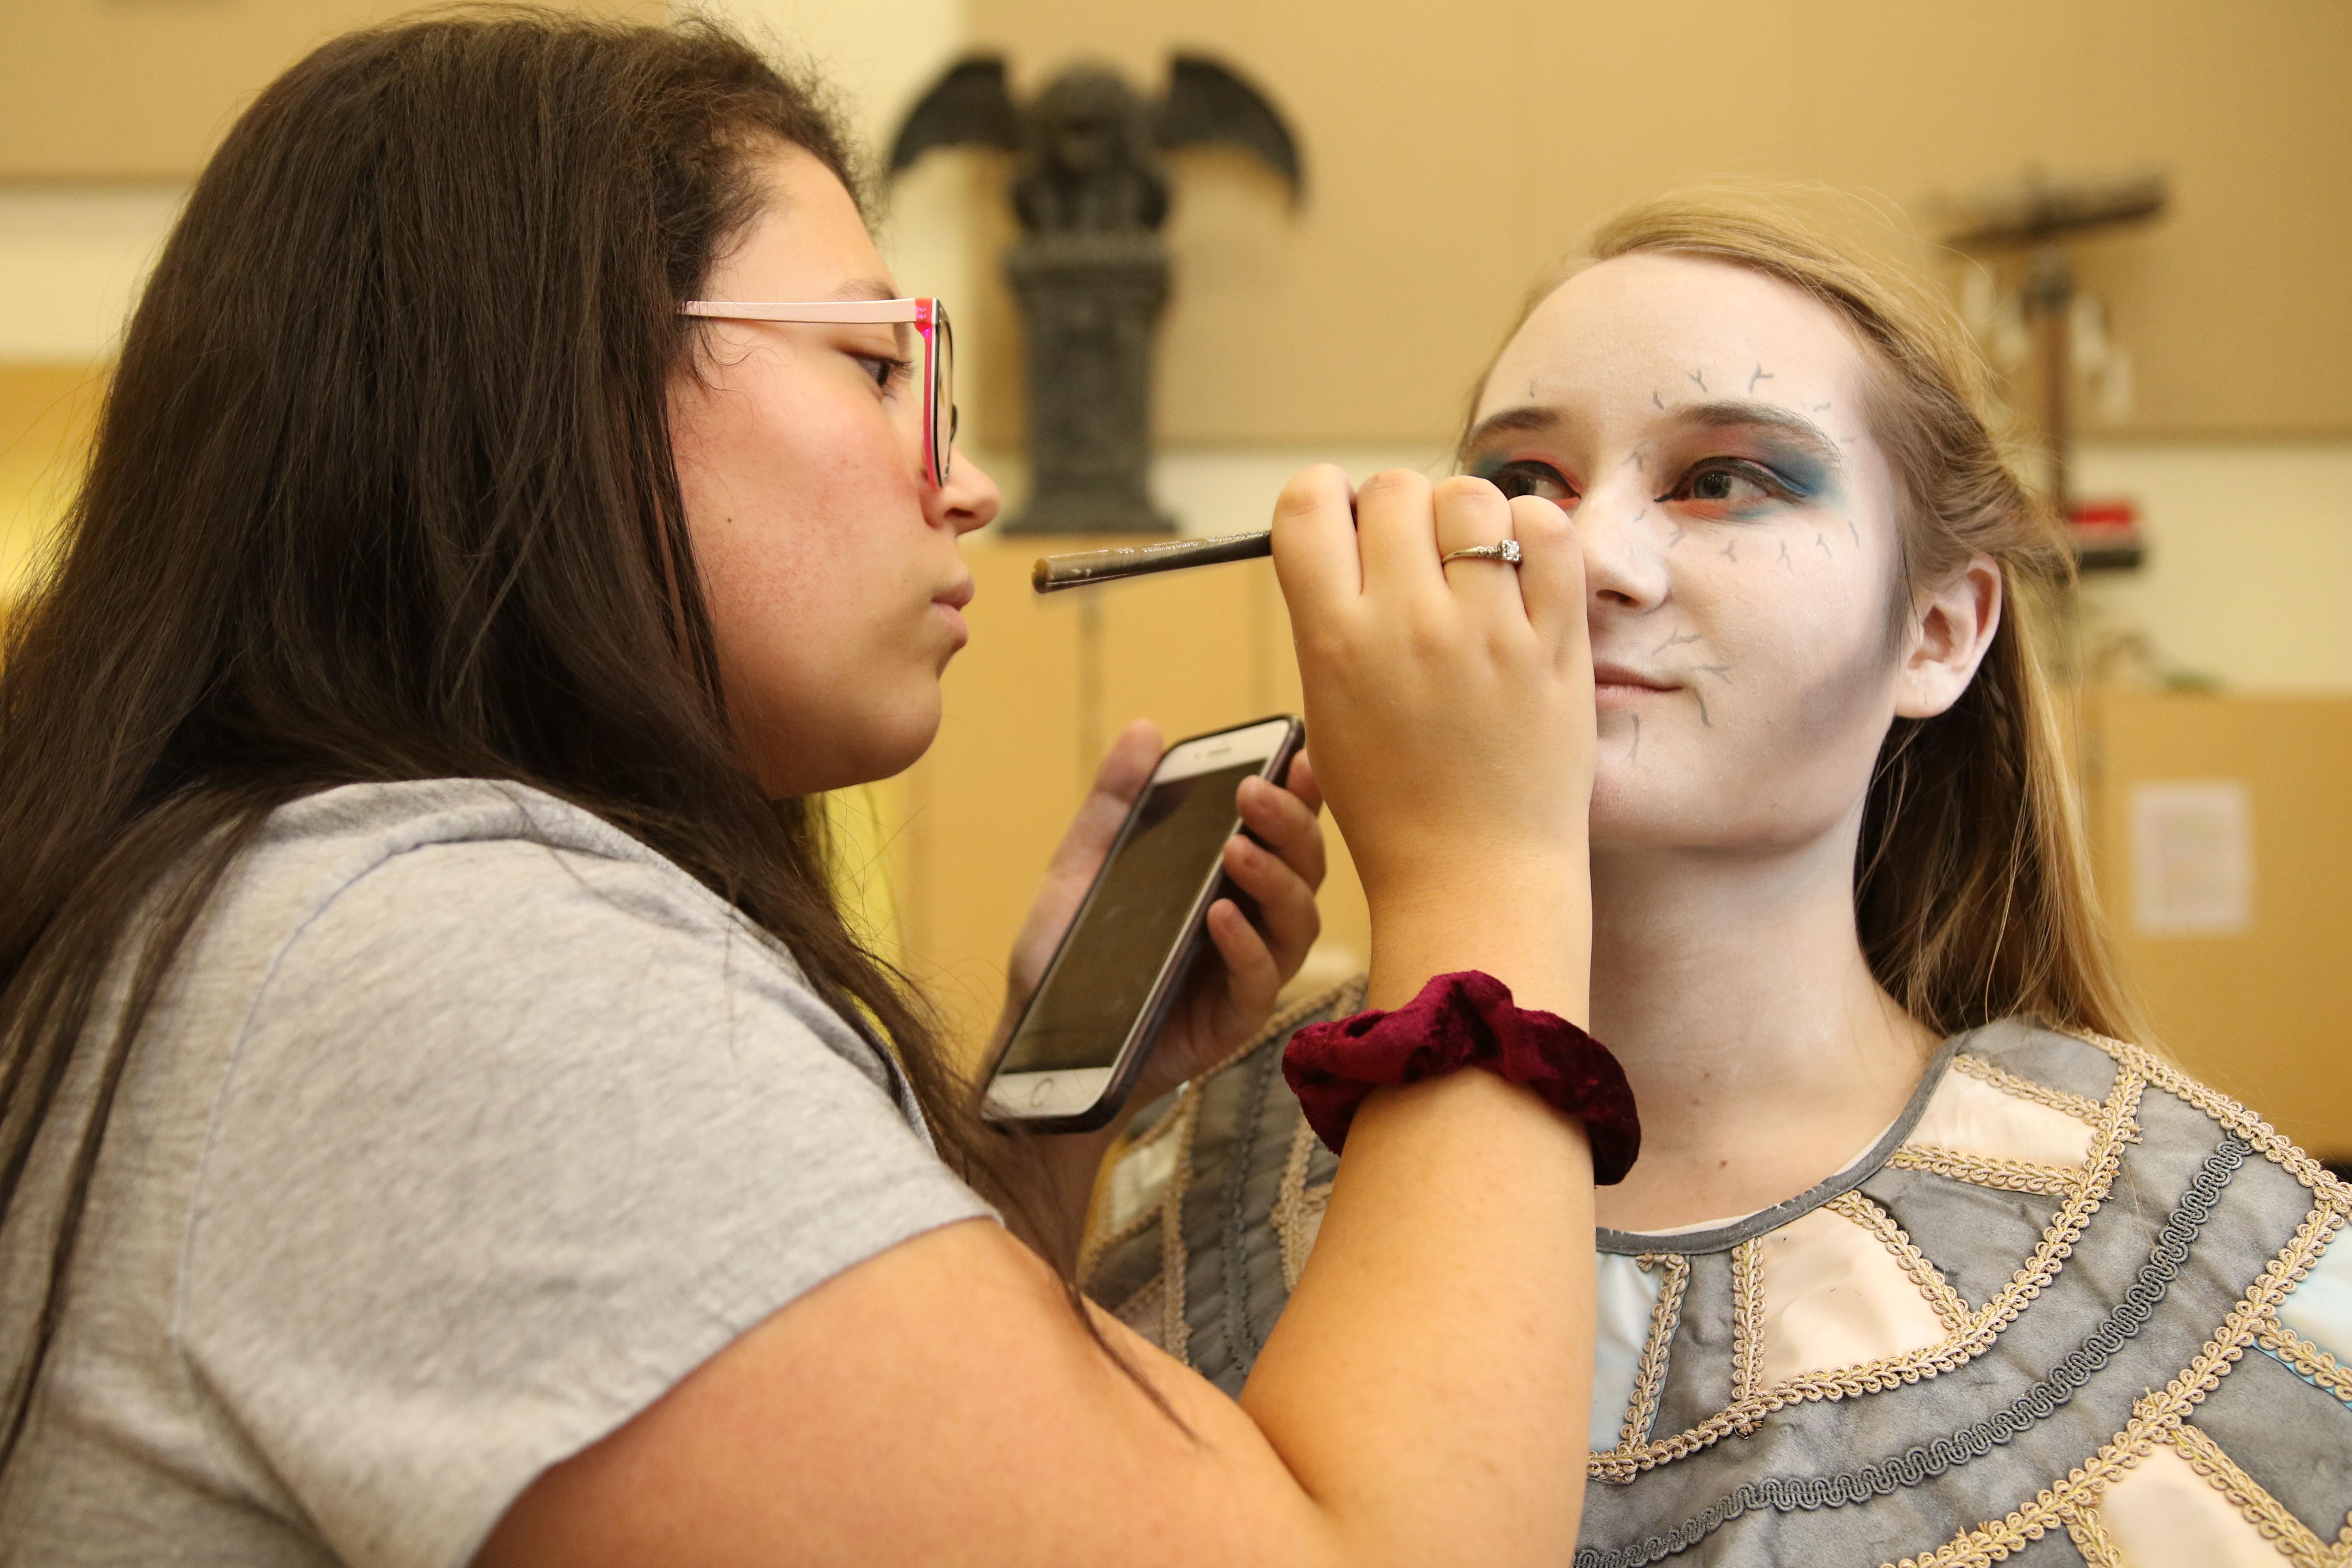 drama makeup11-28-18Laura W (11)